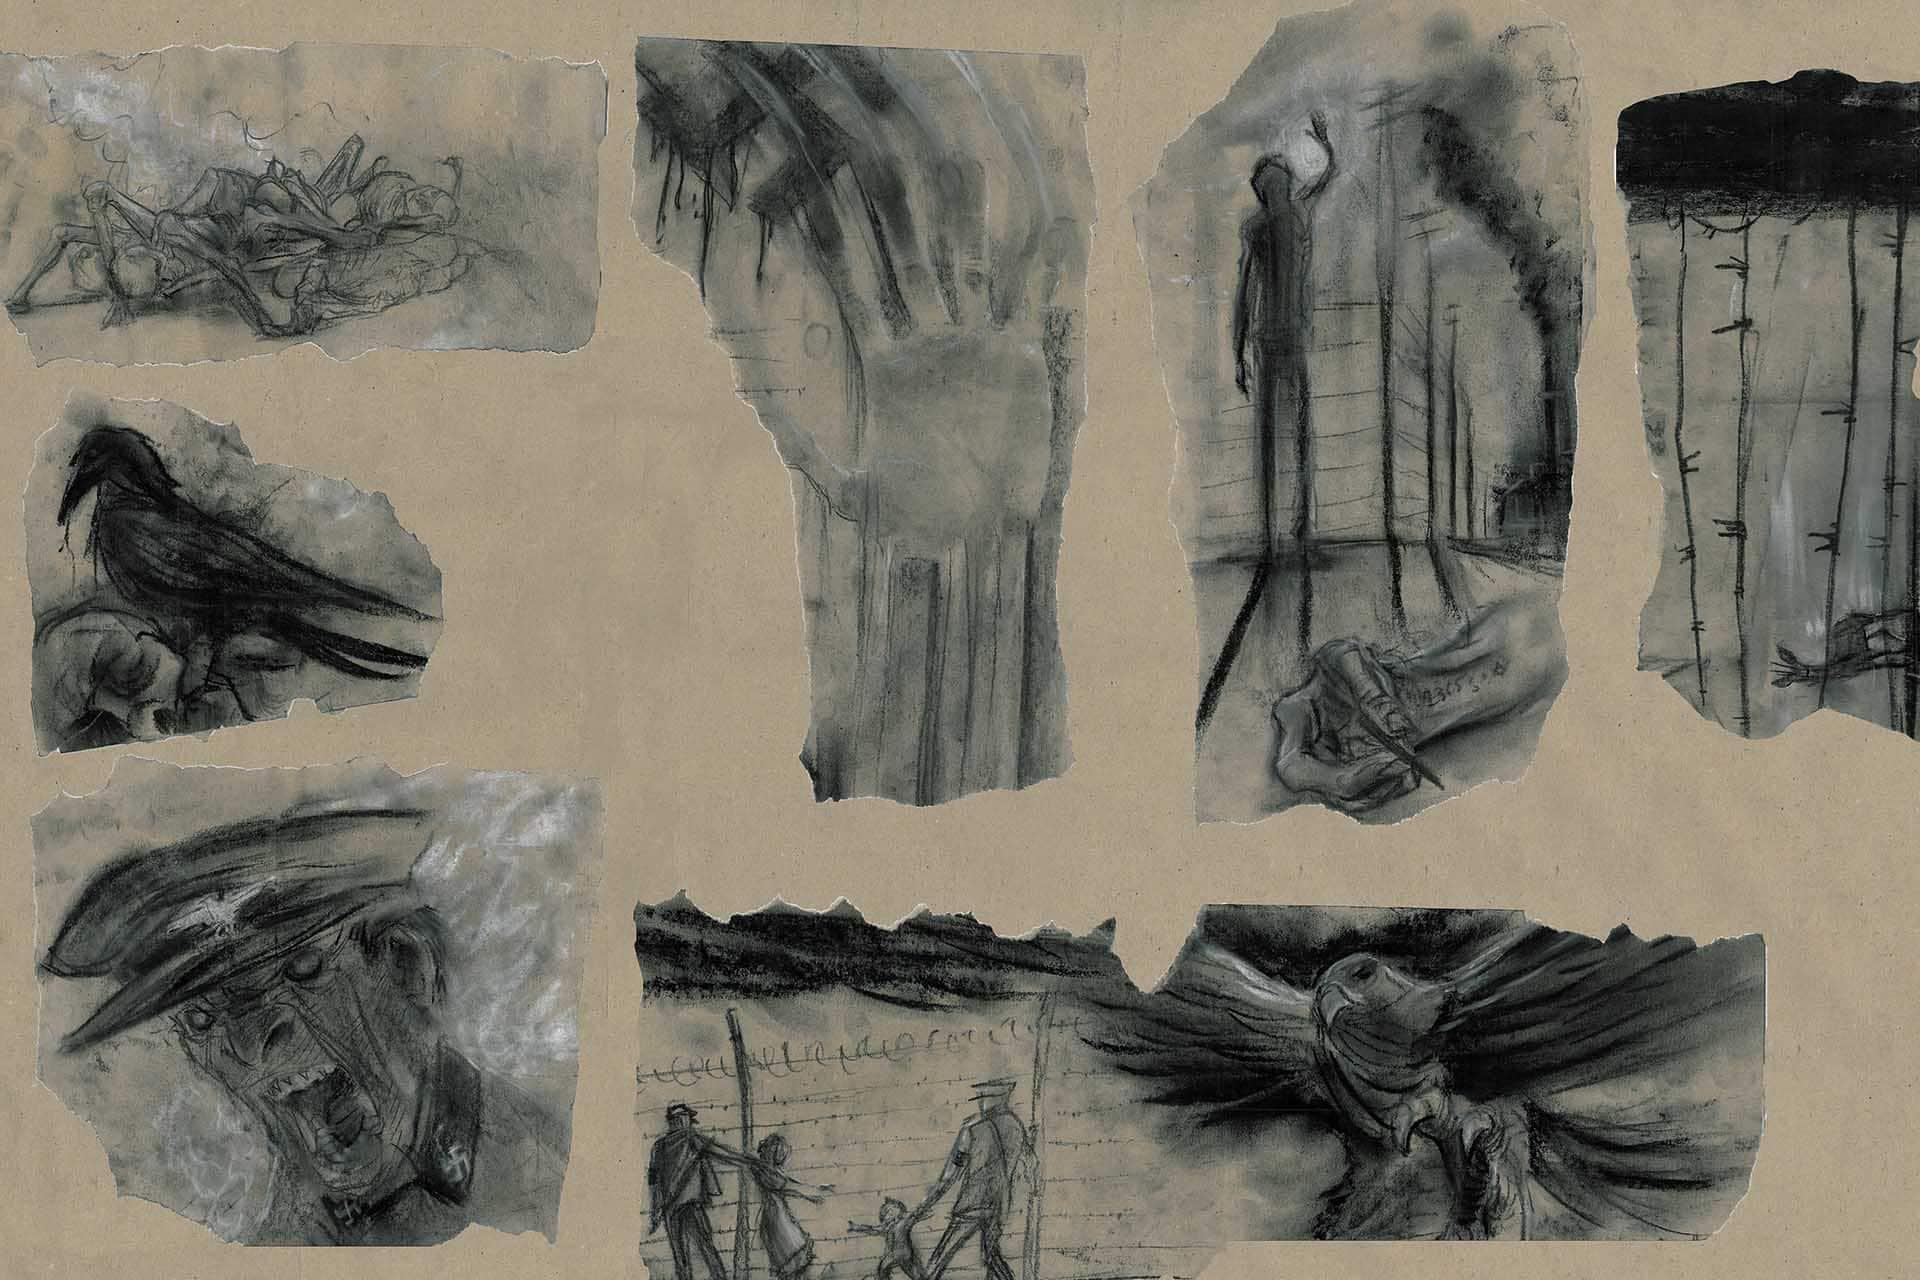 Drawings - Episode 8